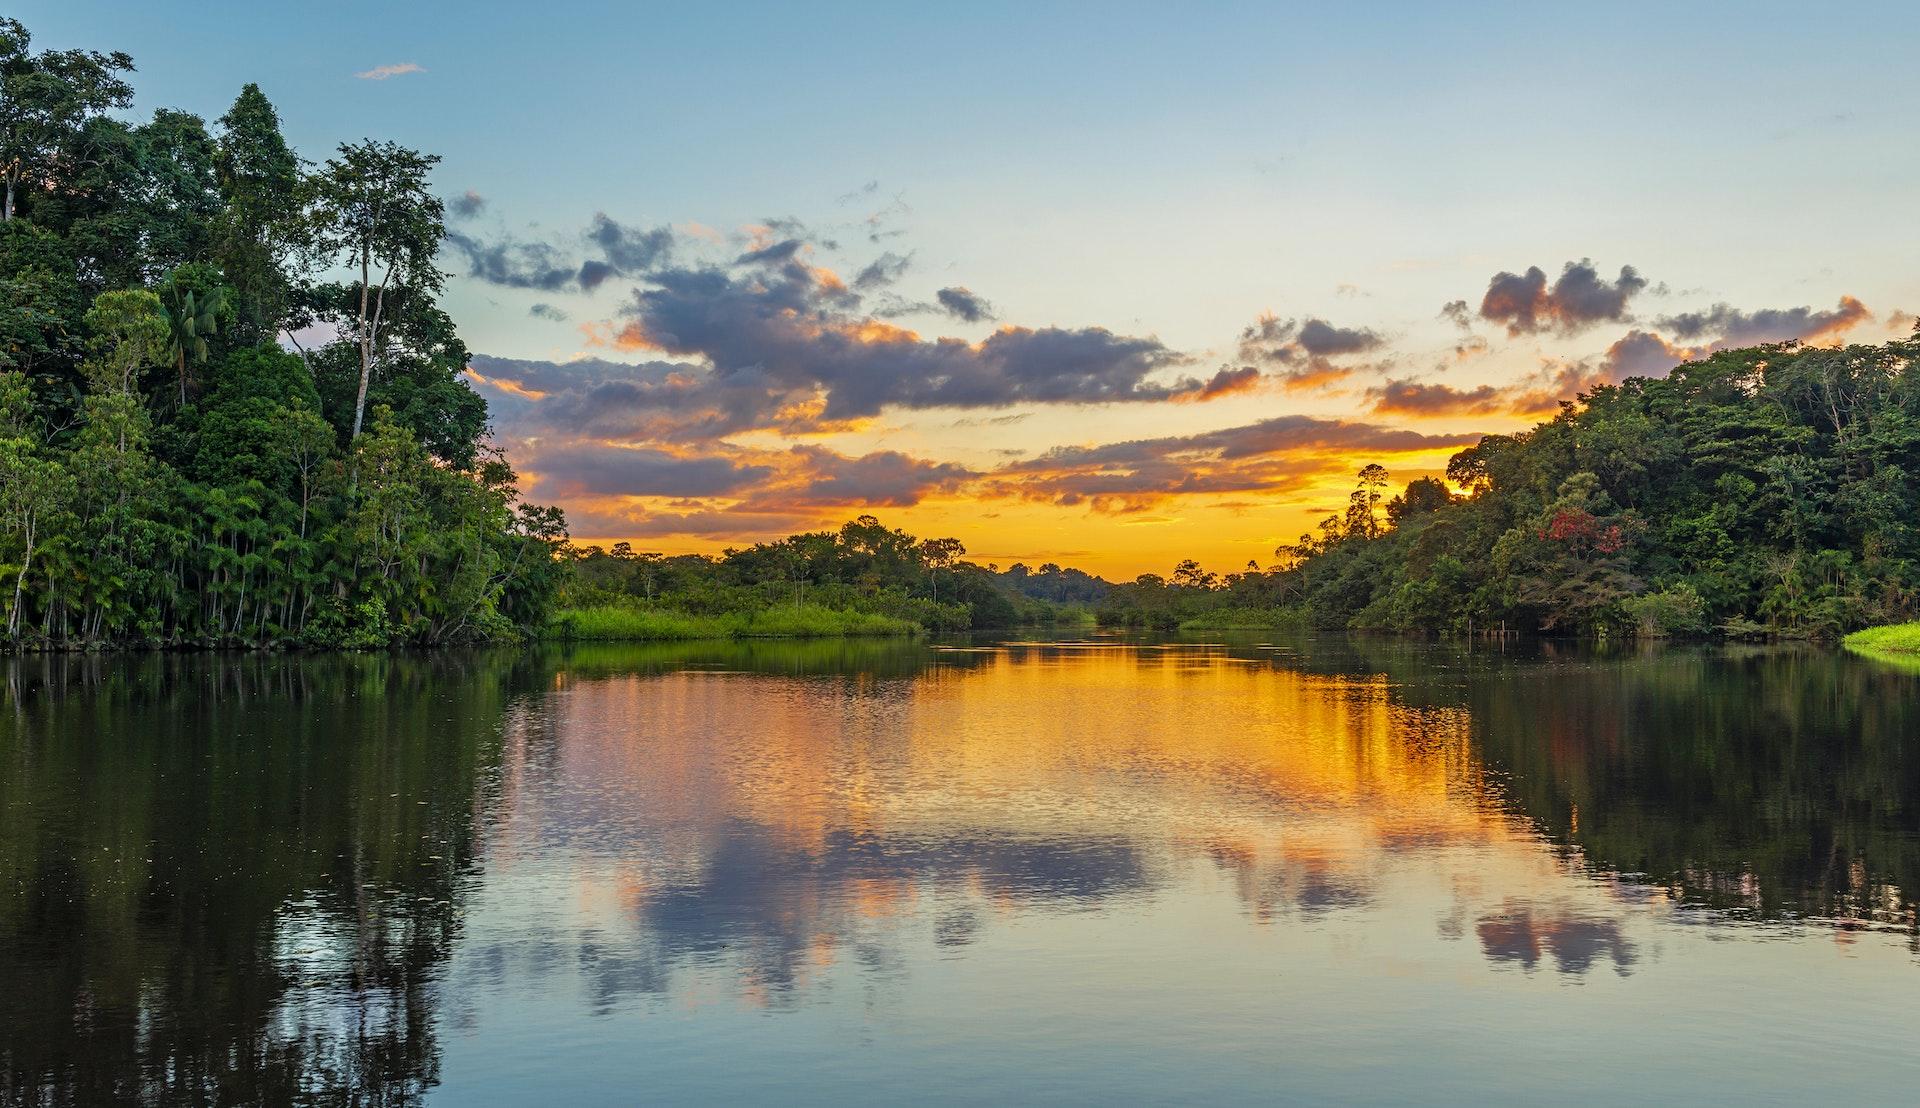 Amazonas, Sør-Amerika @SL_Photography. Getty Images